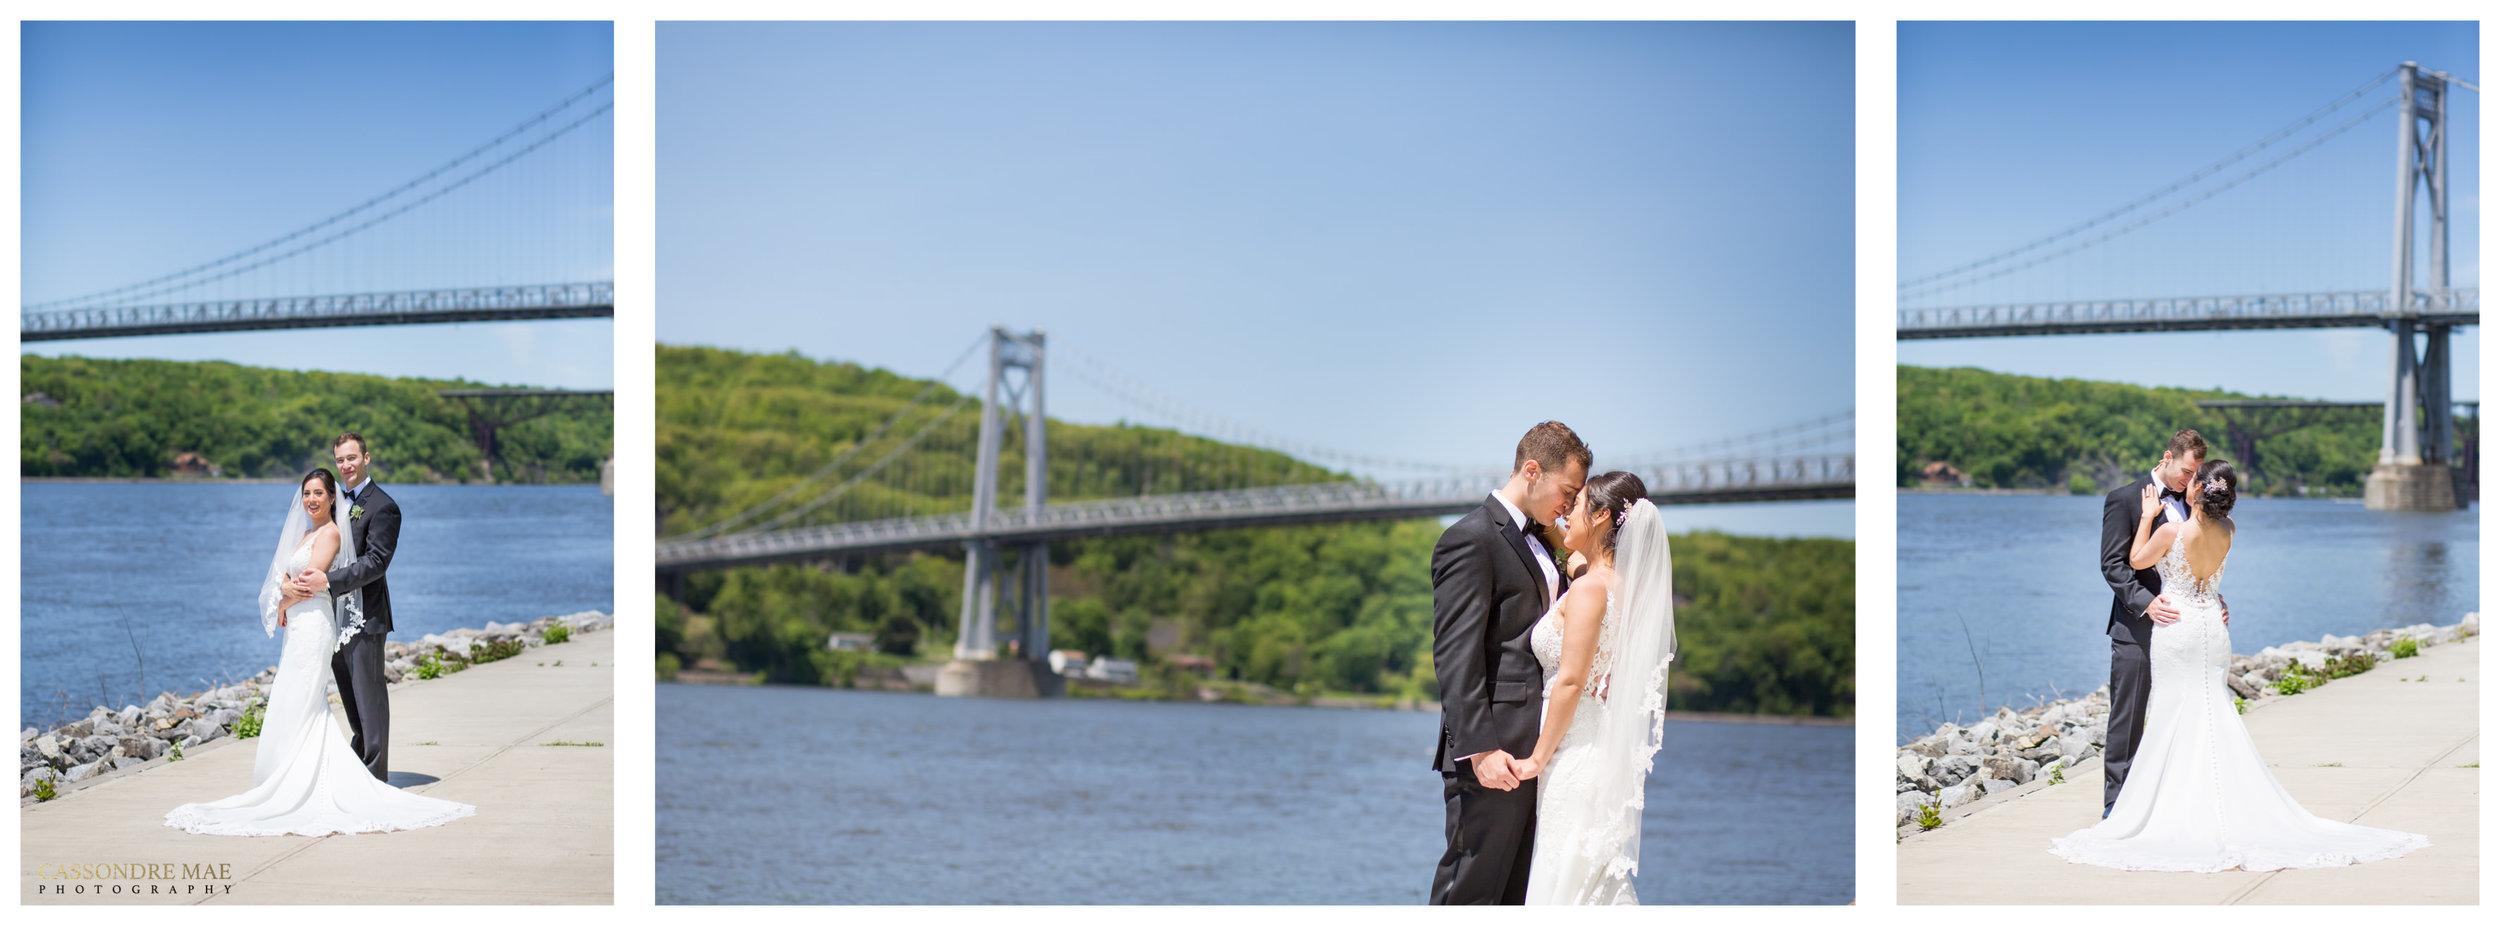 Cassondre Mae Photography The Grandview Poughkeepsie NY Wedding 20.jpg